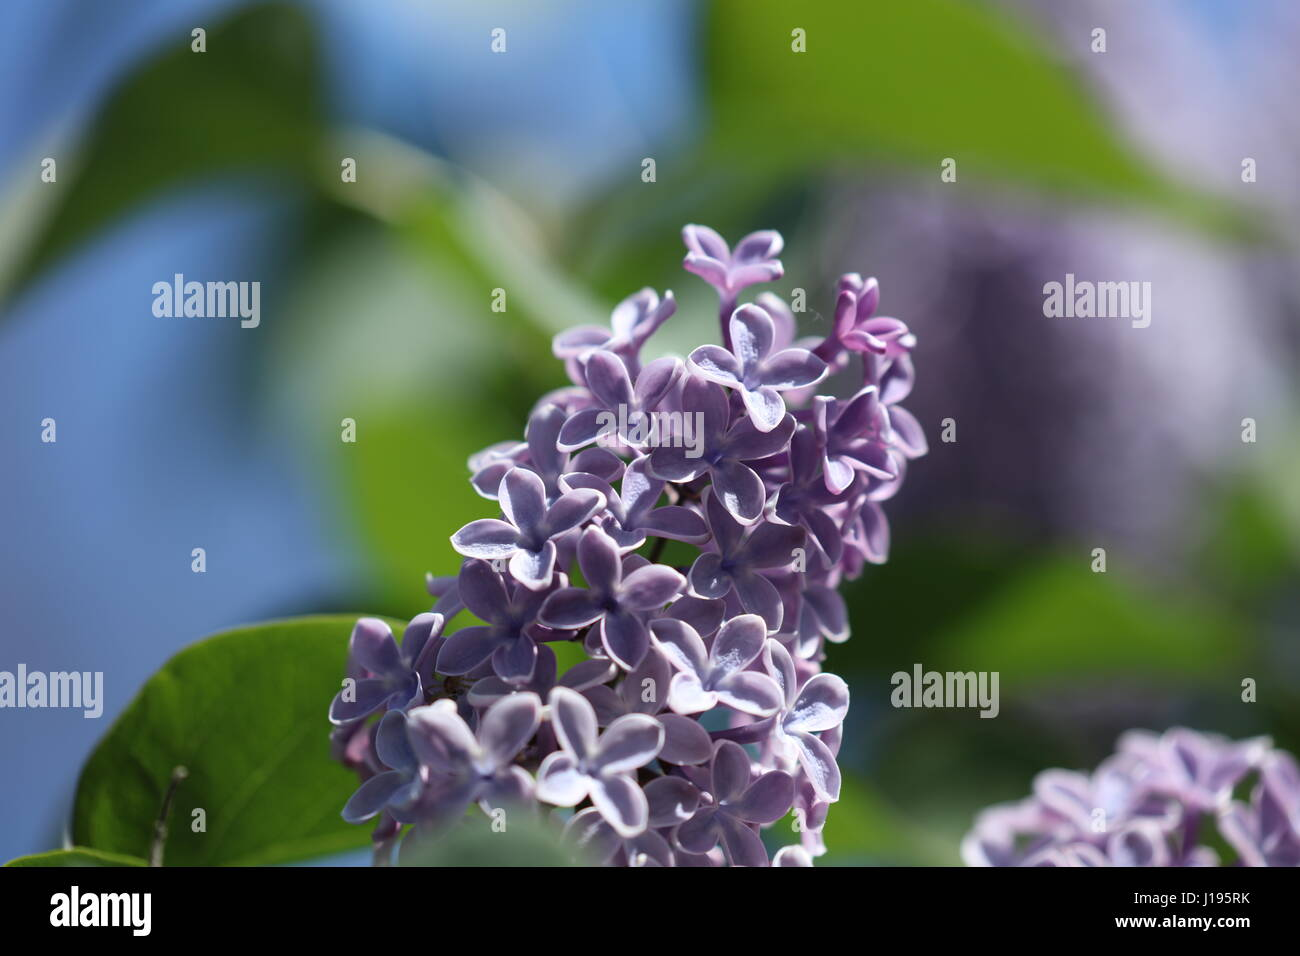 Flieder lila - Stock Image